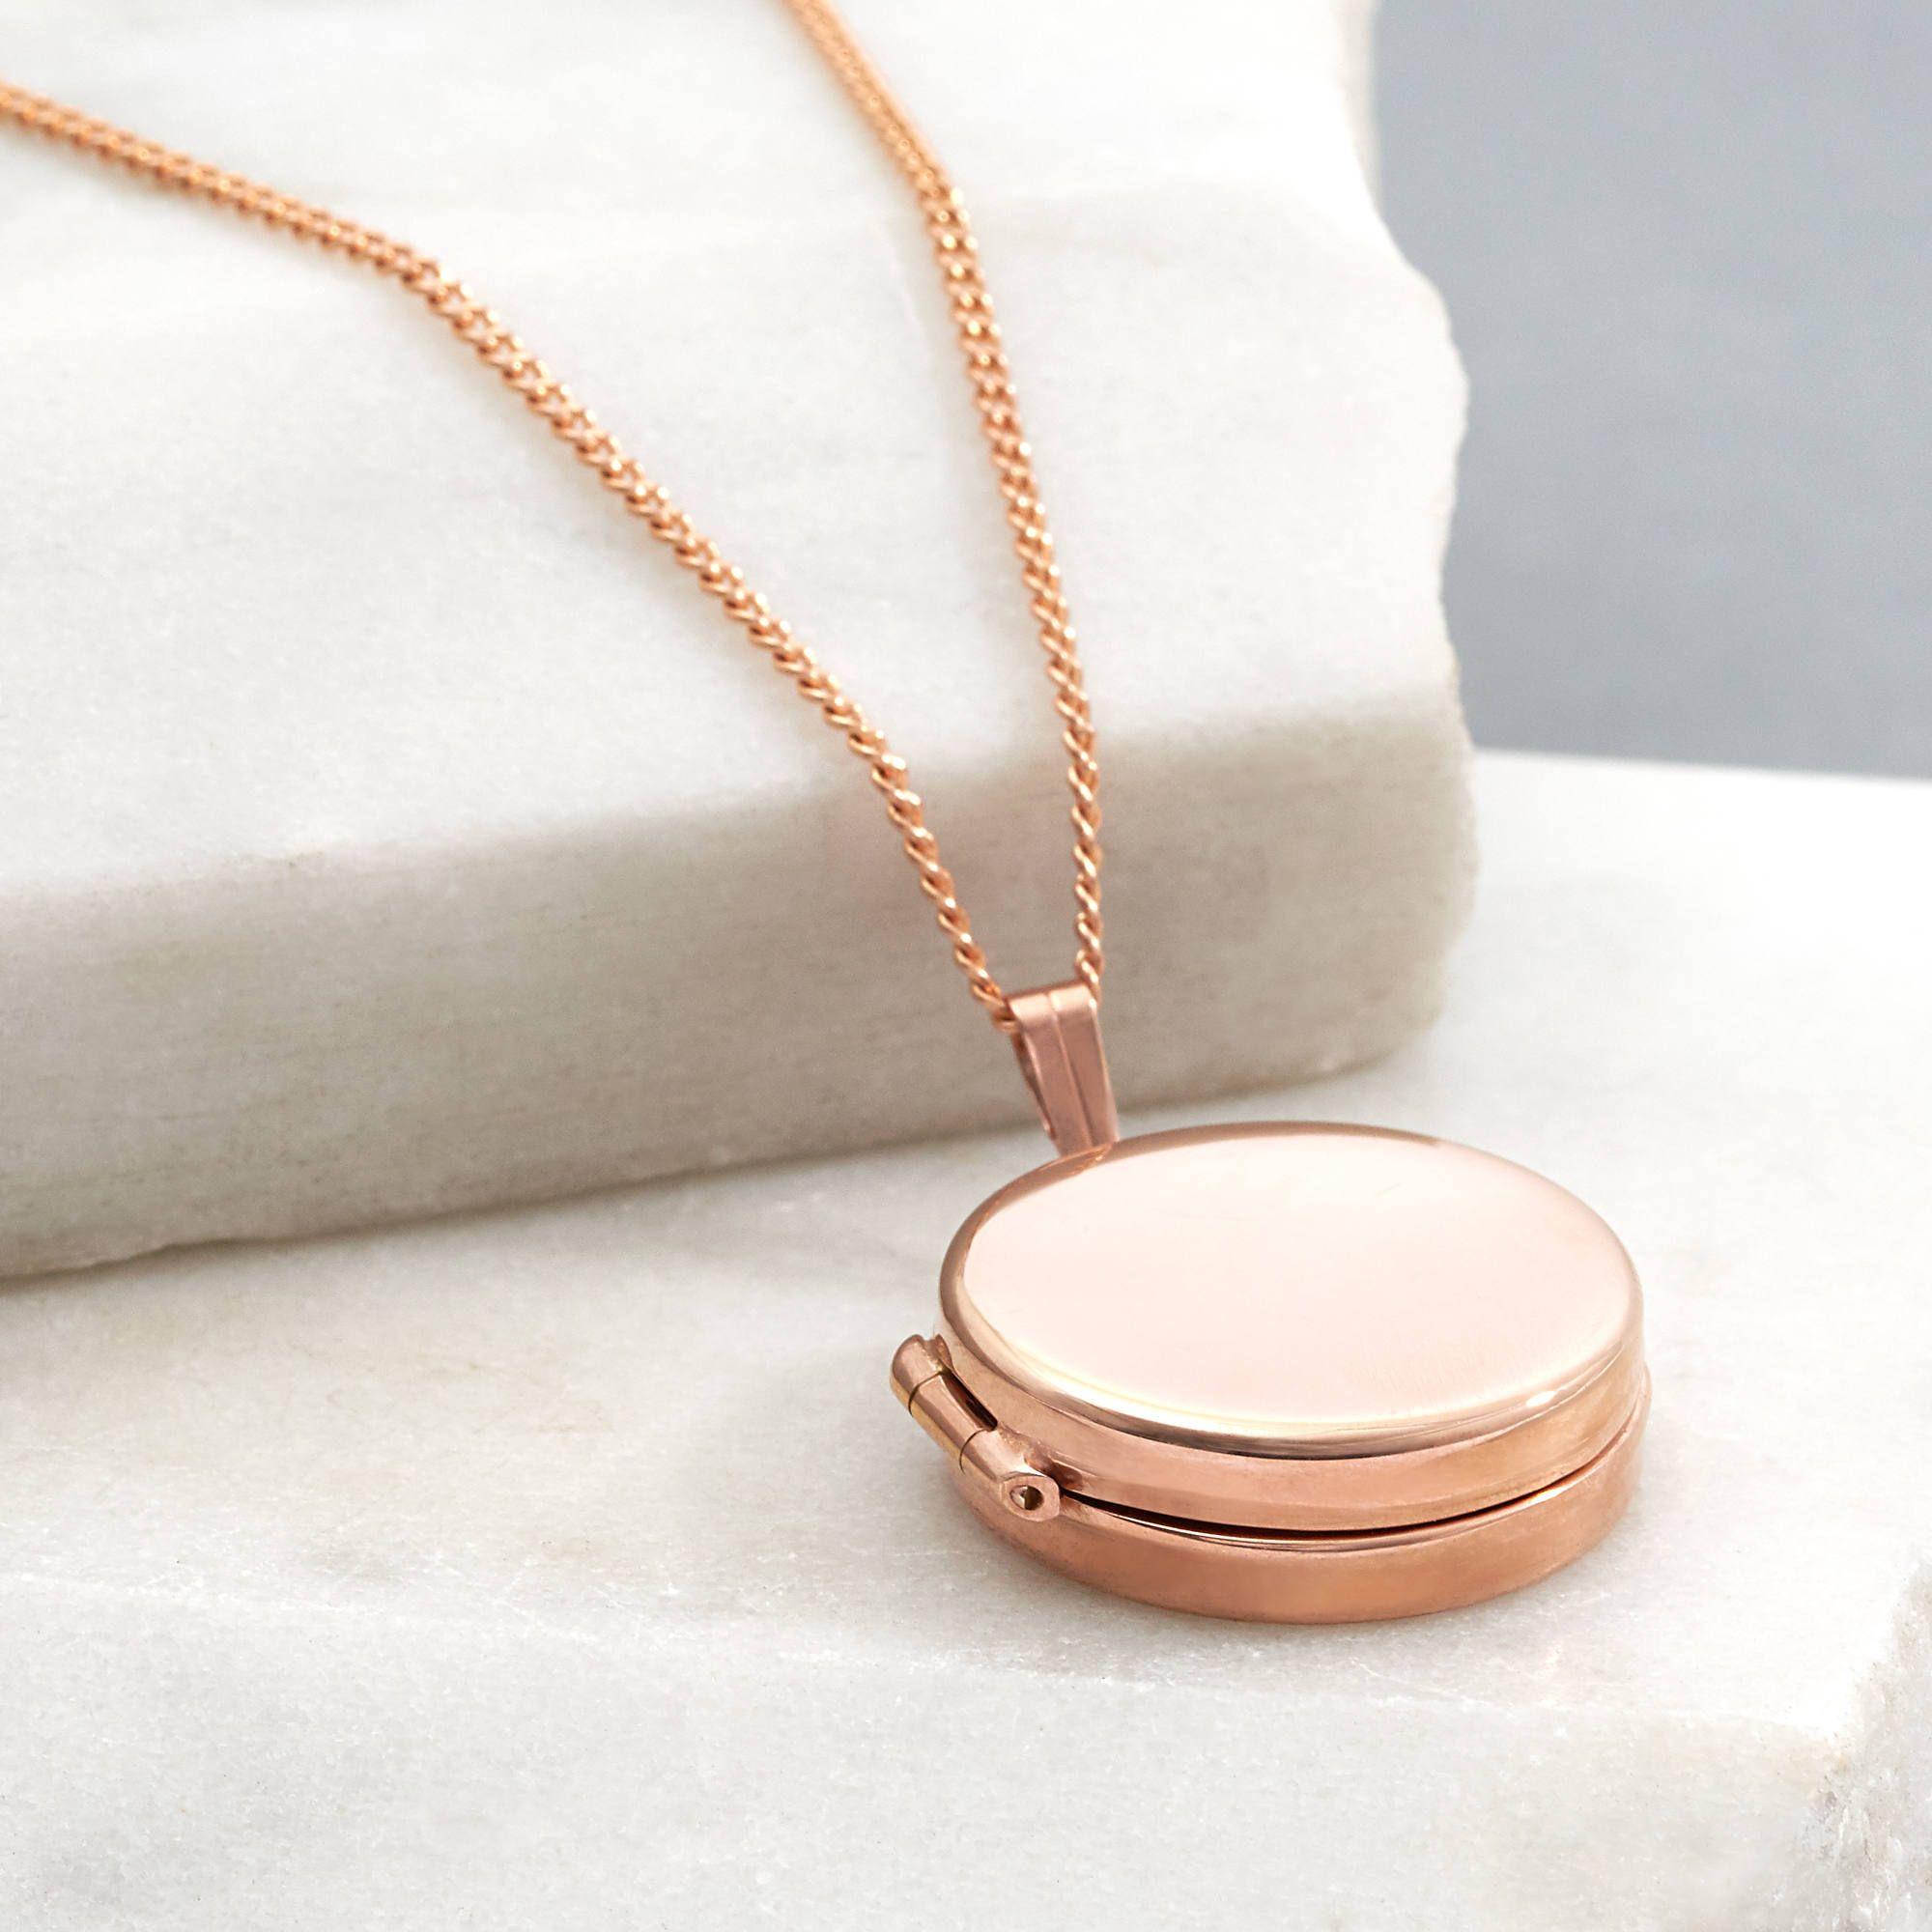 0bbb8fc4fdcc4 Round Drum Locket in Rose Gold Vermeil   Necklaces